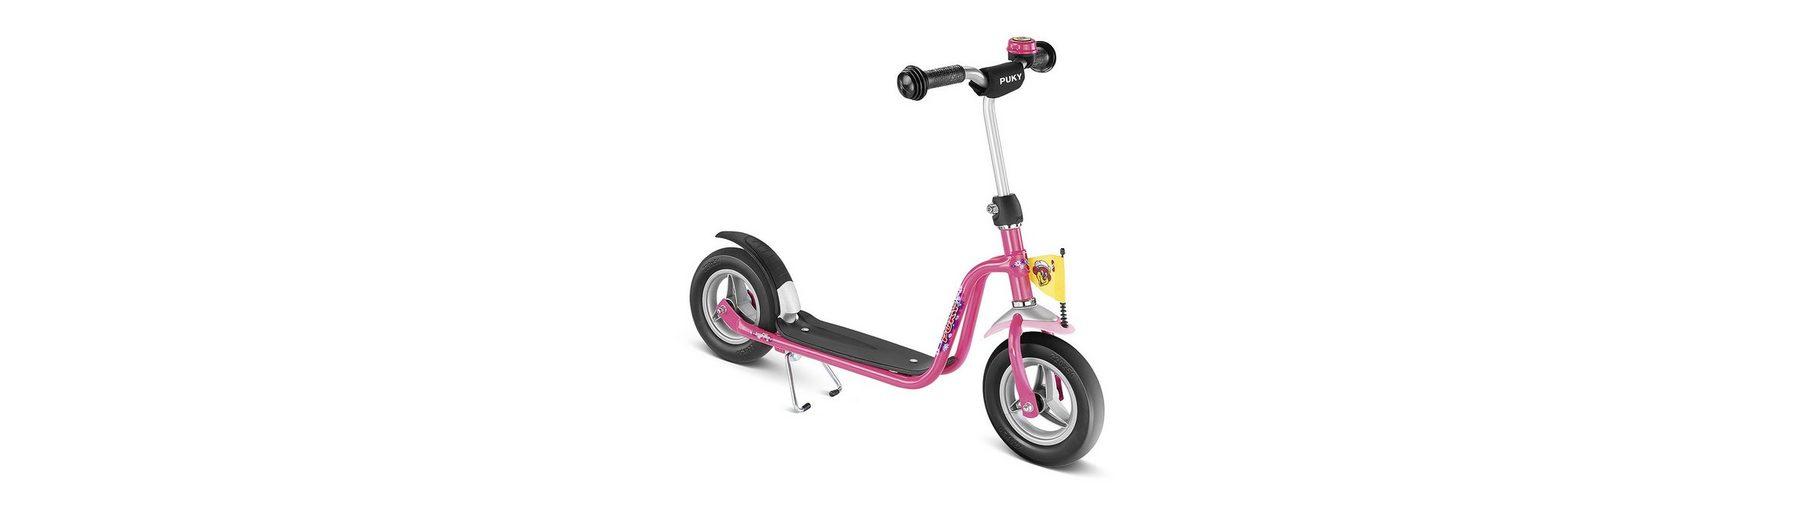 Puky Kinderfahrzeug »R03 Ballonroller lovely pink«